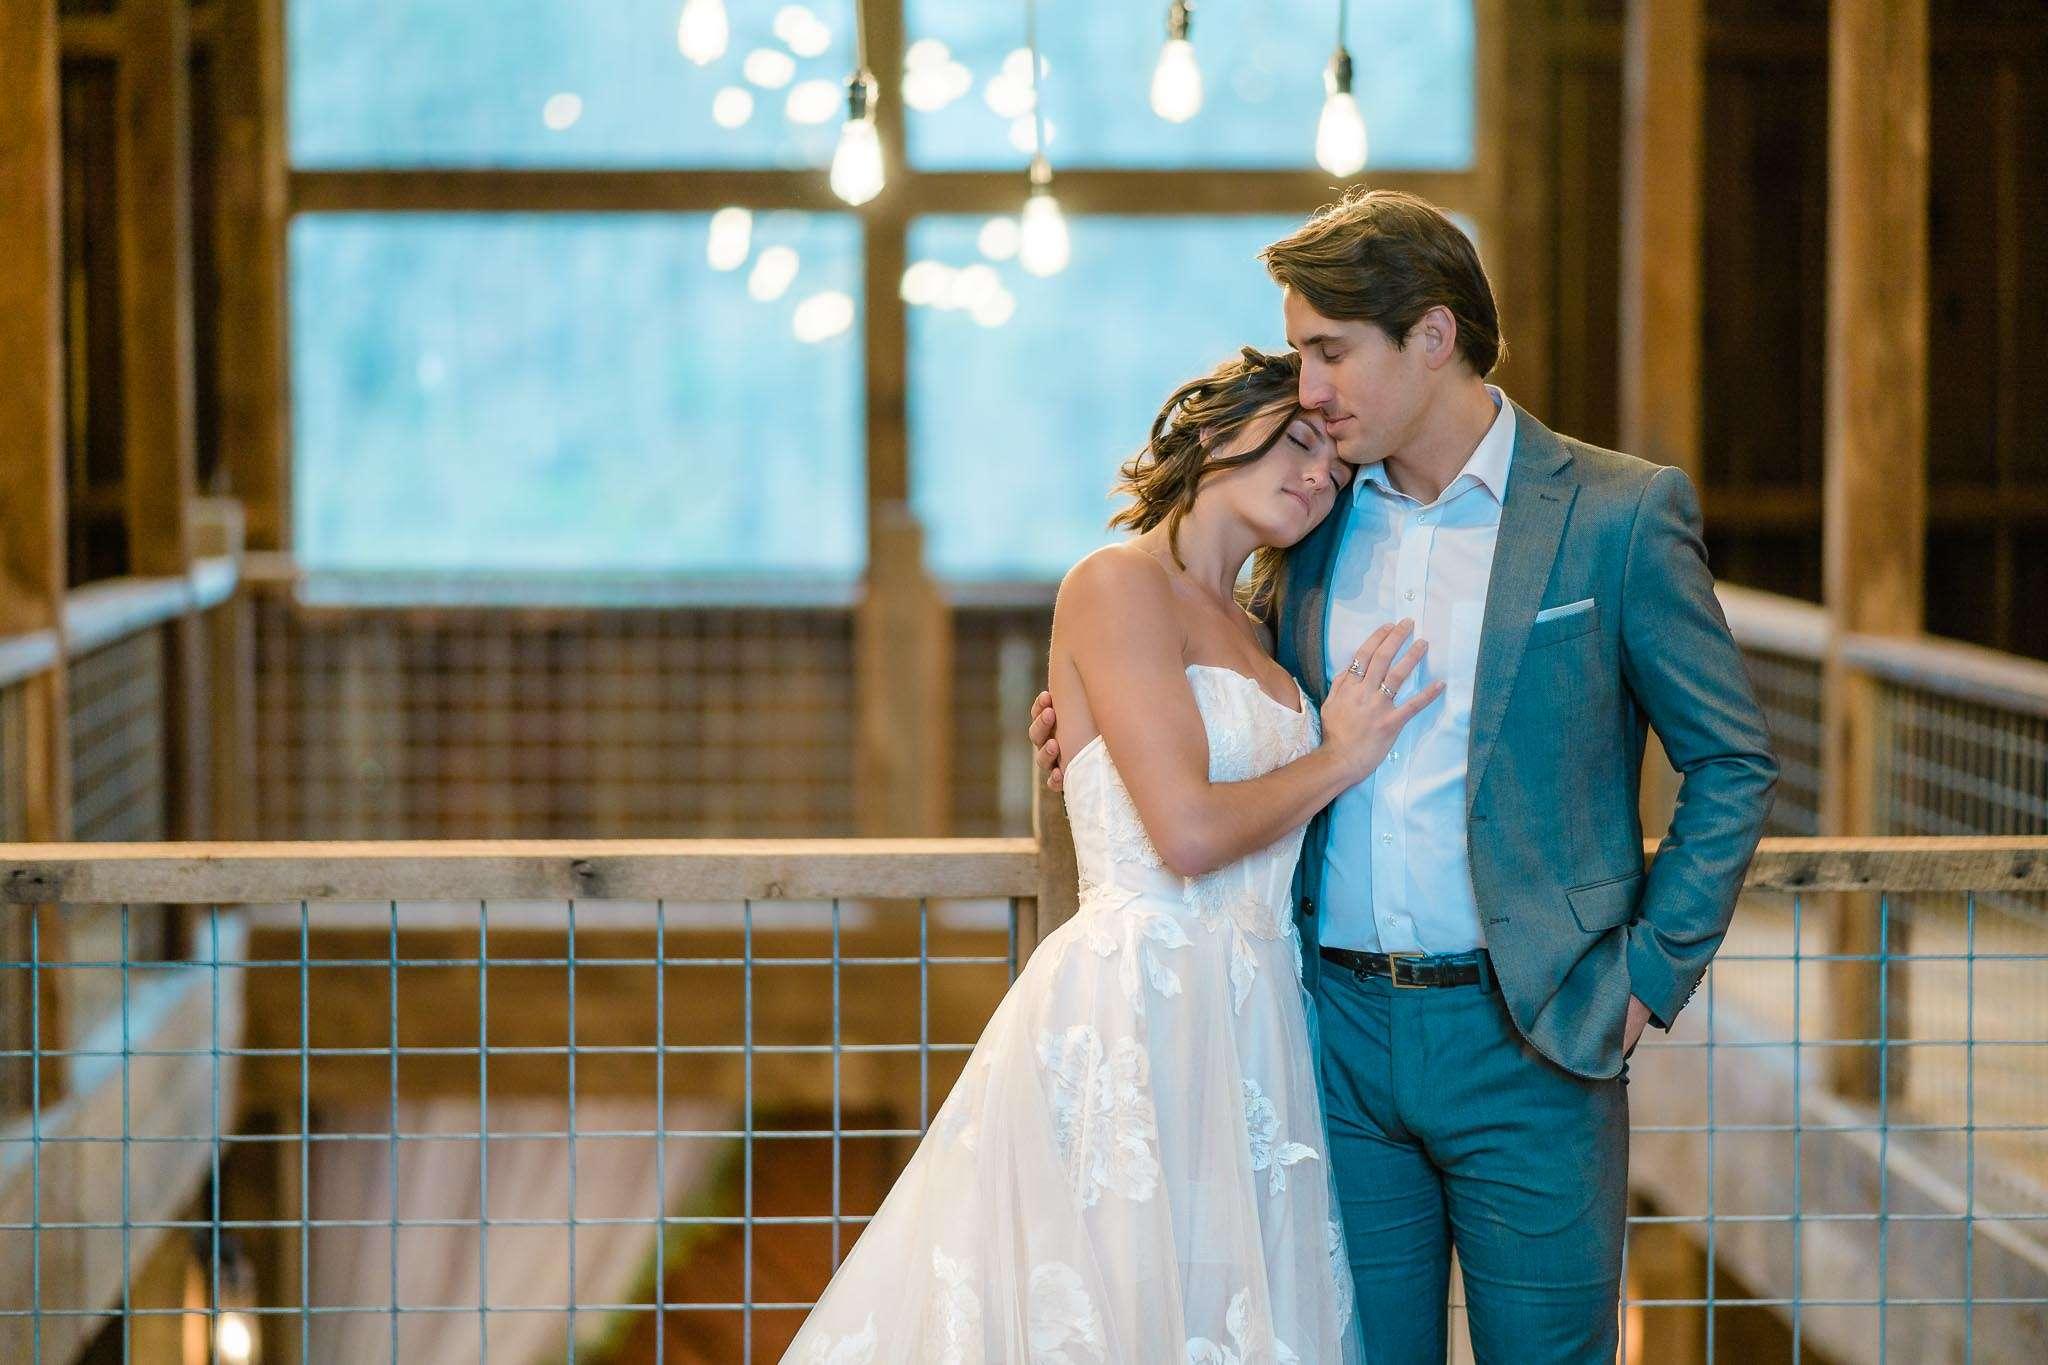 Clarksville, TN Wedding Photographer - Keepsake Wedding Photography